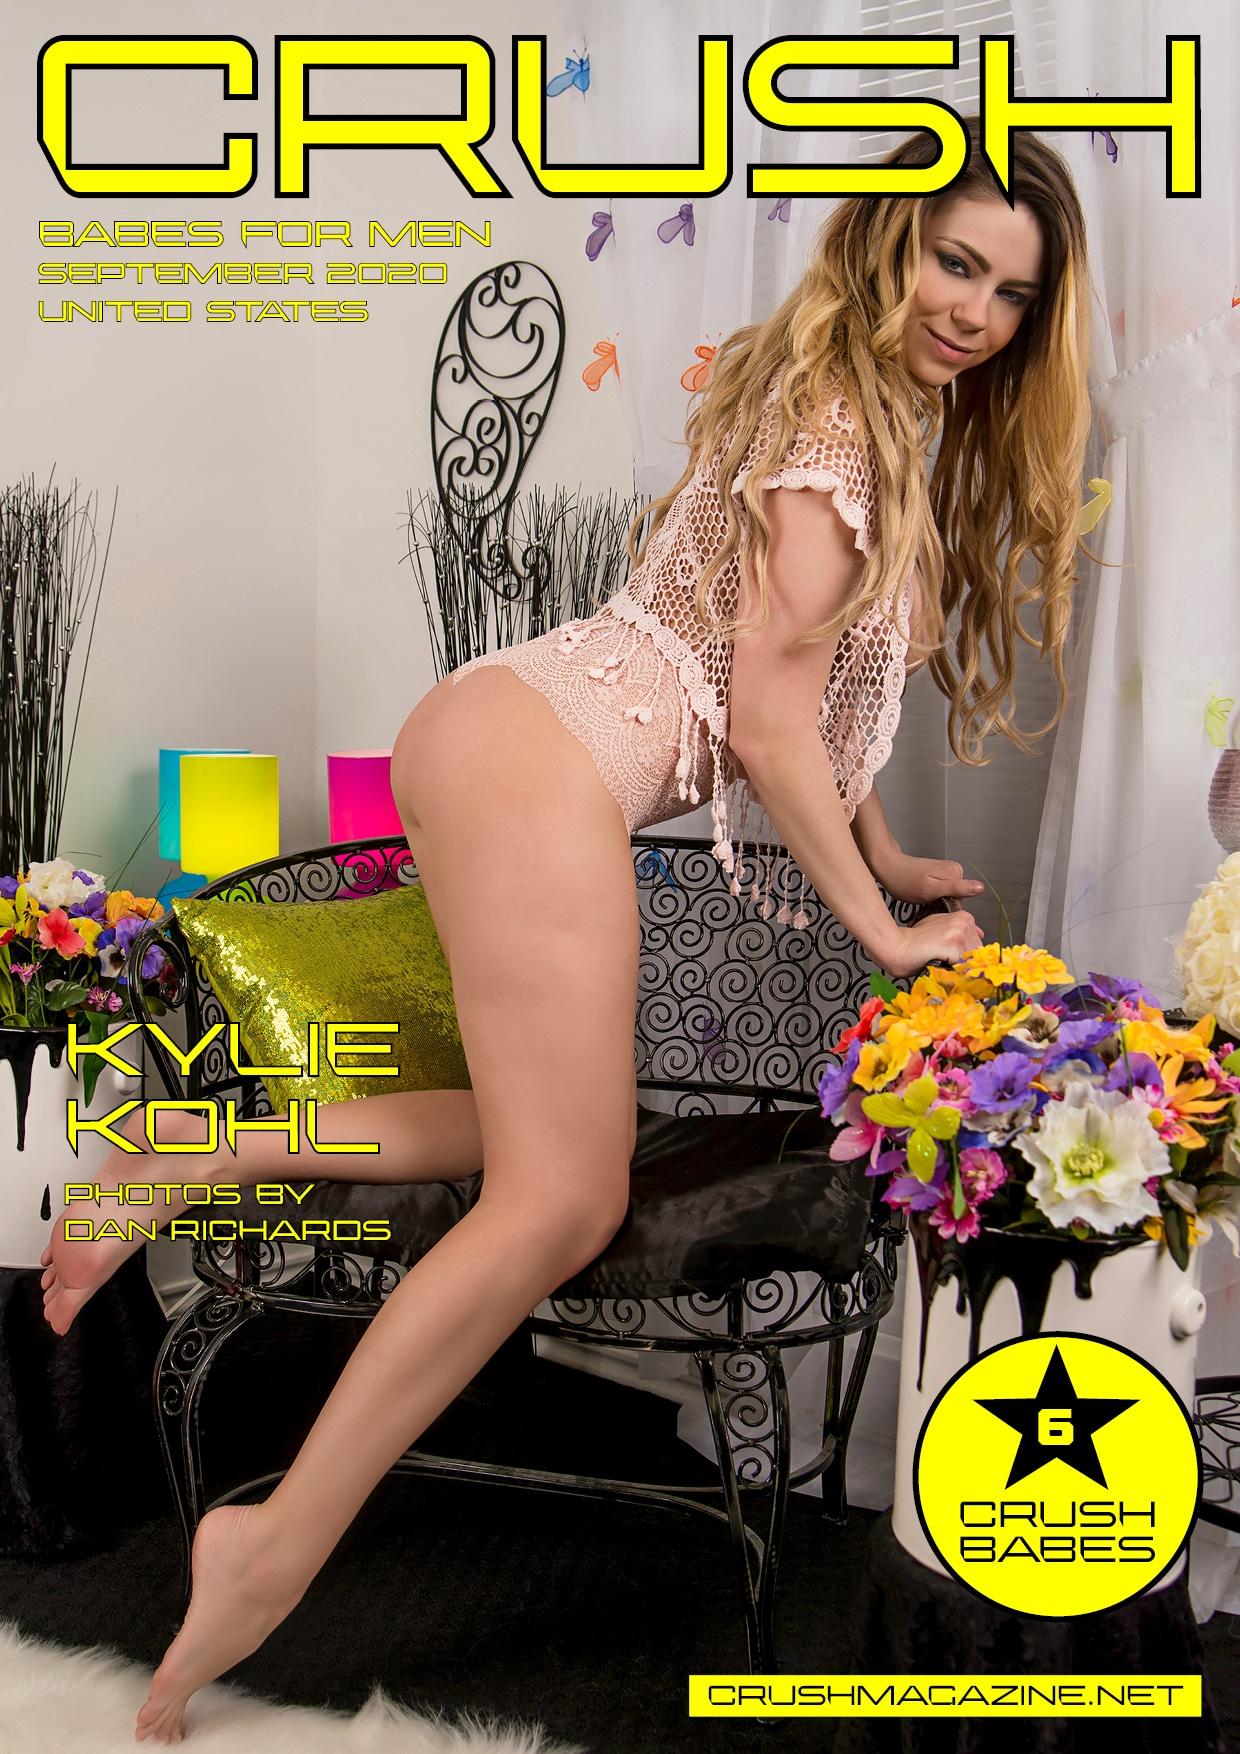 Crush Magazine - September 2020 - Kylie Kohl